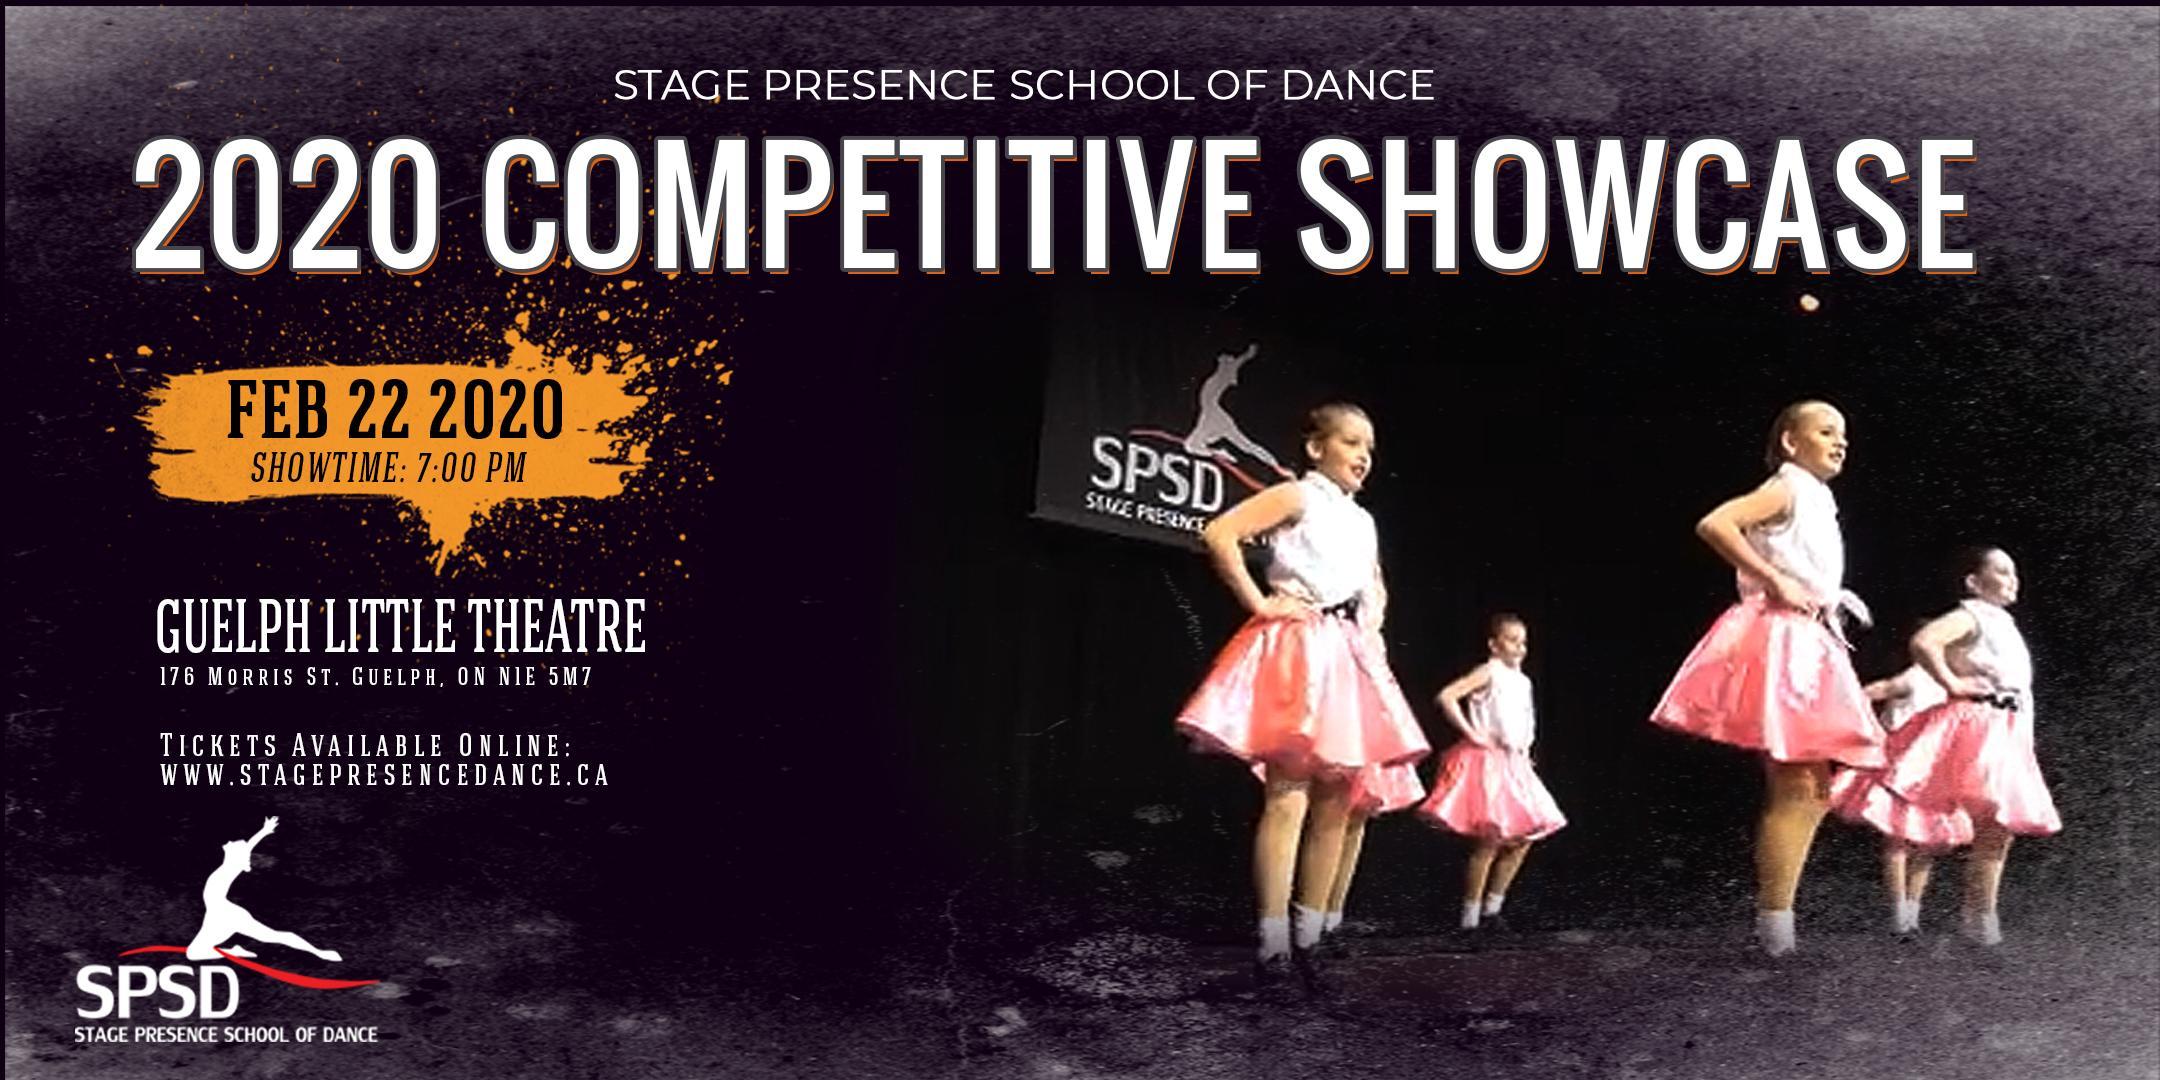 SPSD Competitive Showcase 2020